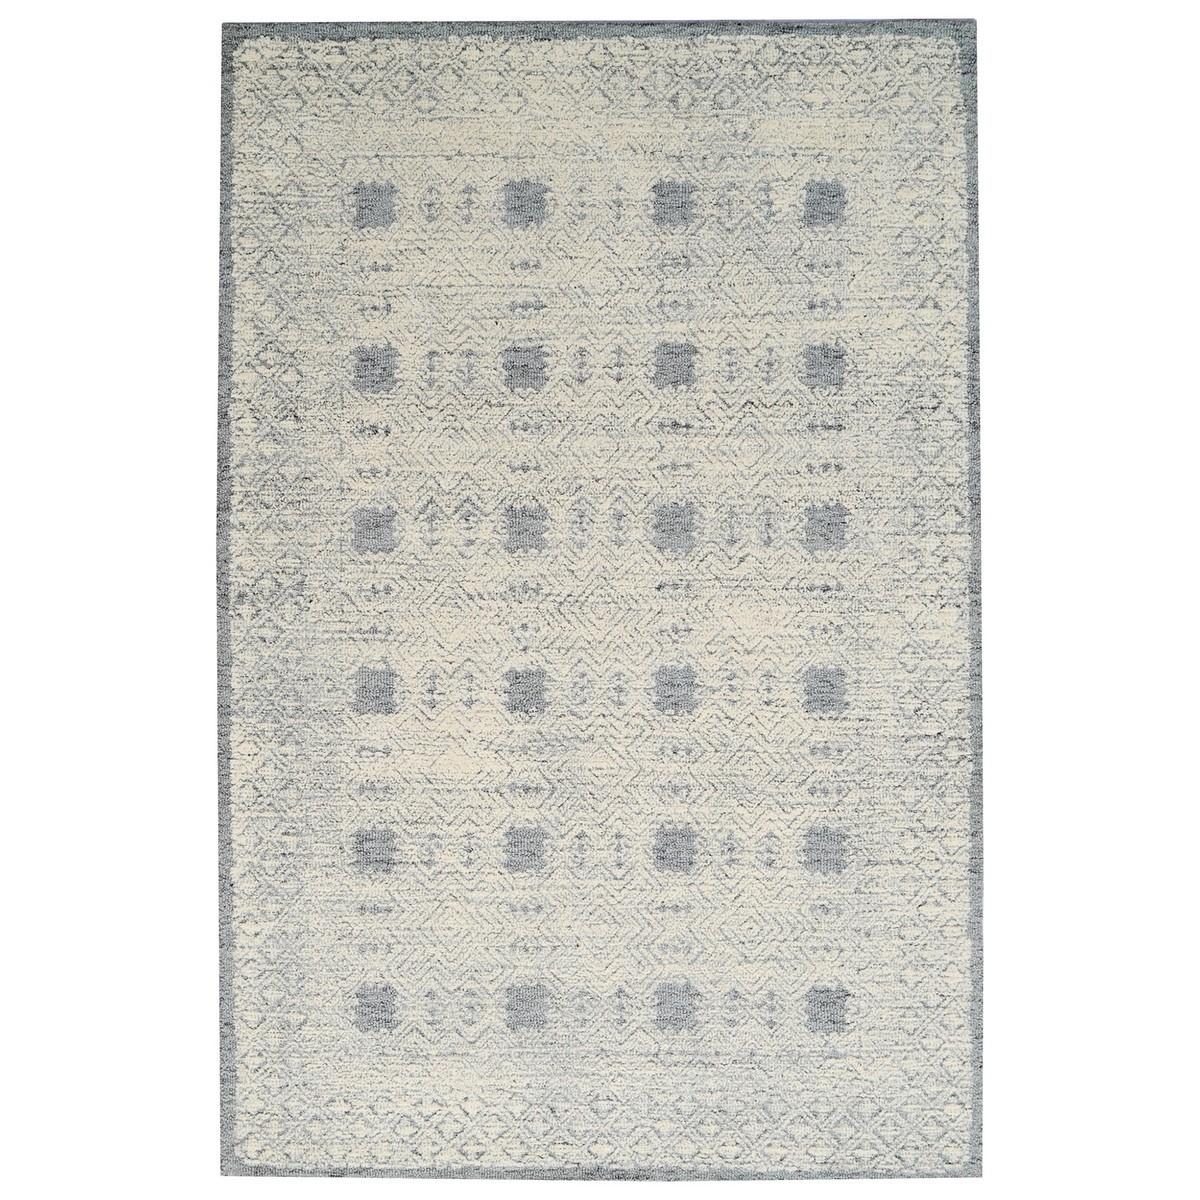 Newcastle Handmade Wool Rug, 160x110cm